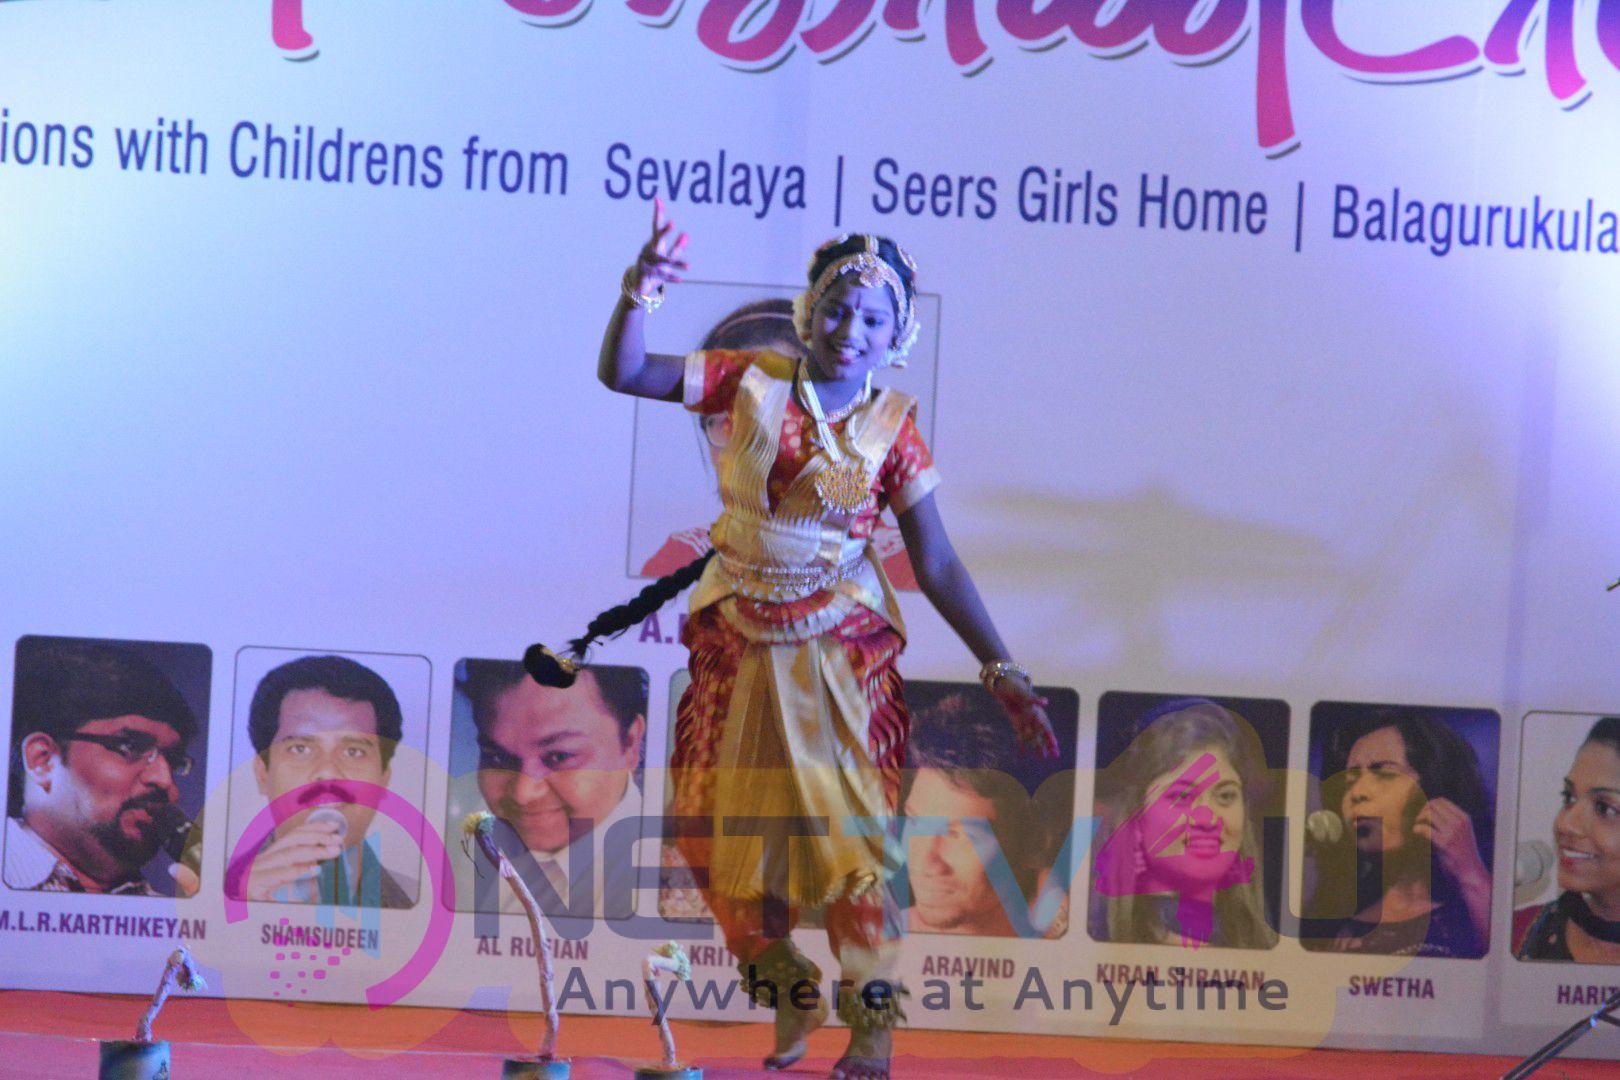 Raindropss Diwali Kondattam Musically With 375 Less Childrens Tamil Gallery